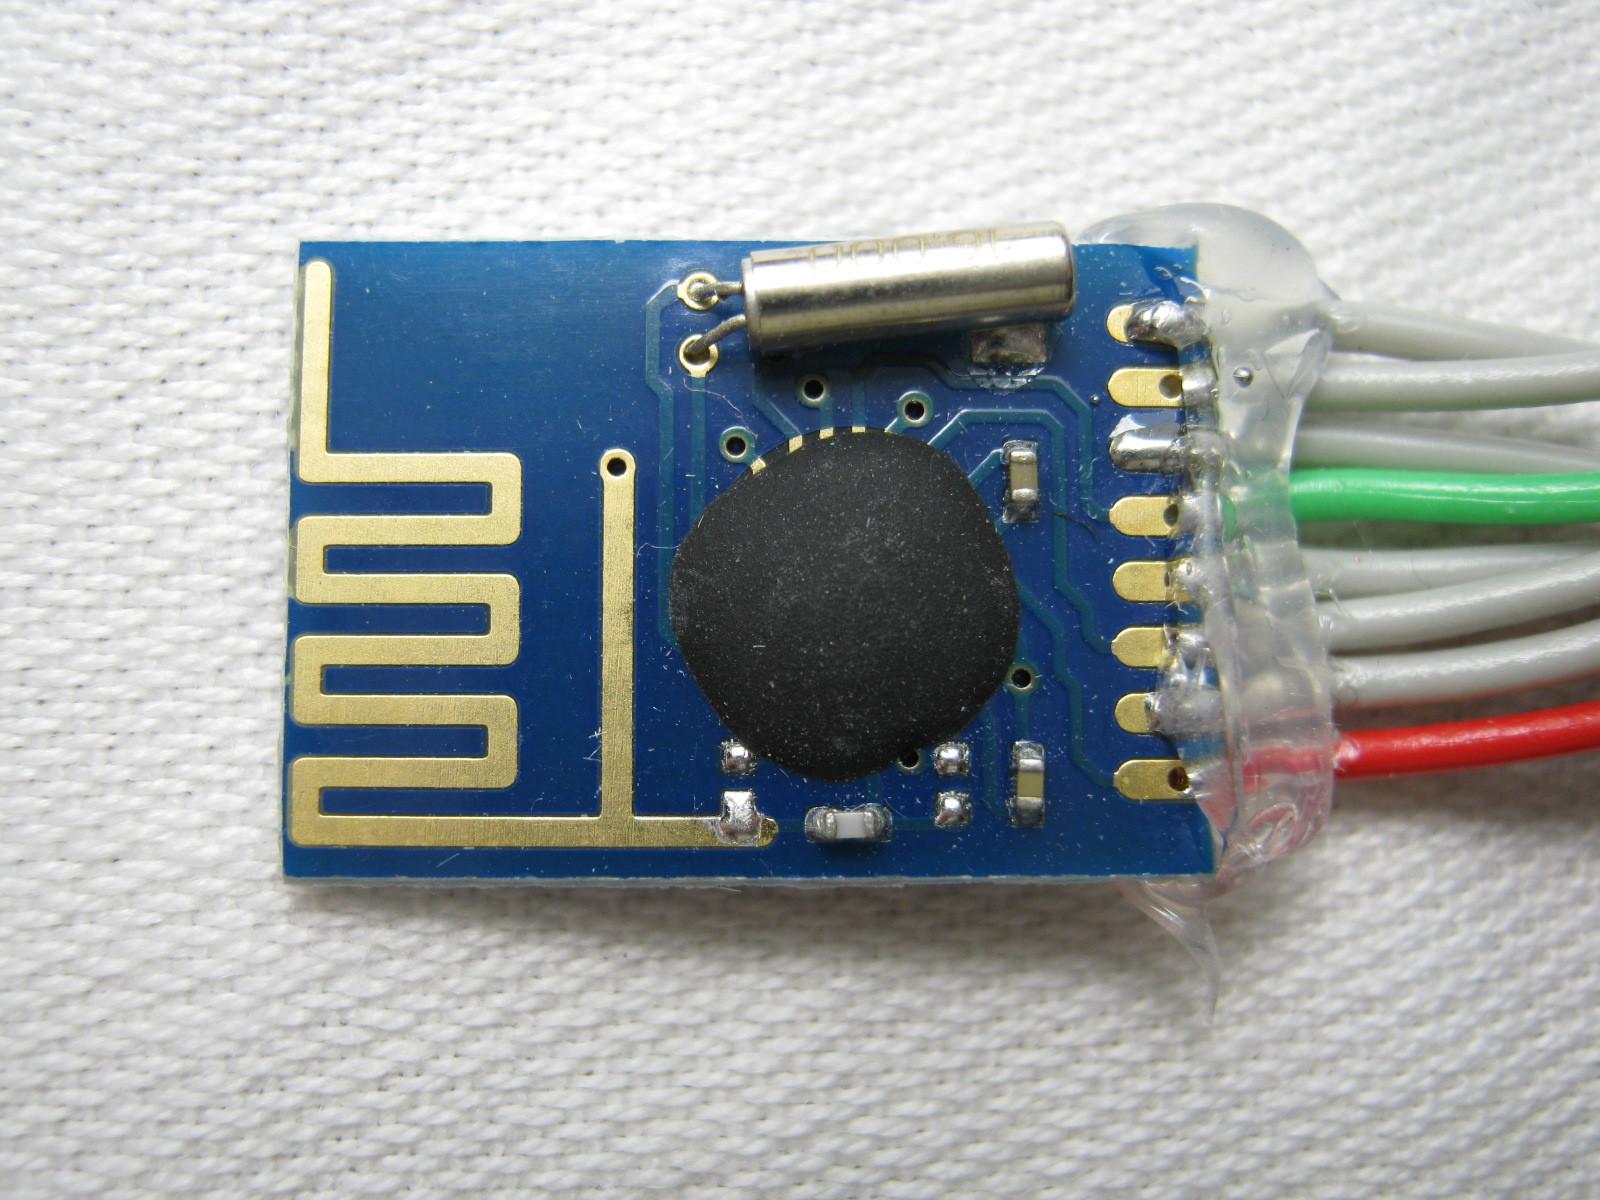 2400MGHzラジコン用ファームウェア(SE8R01)外観4